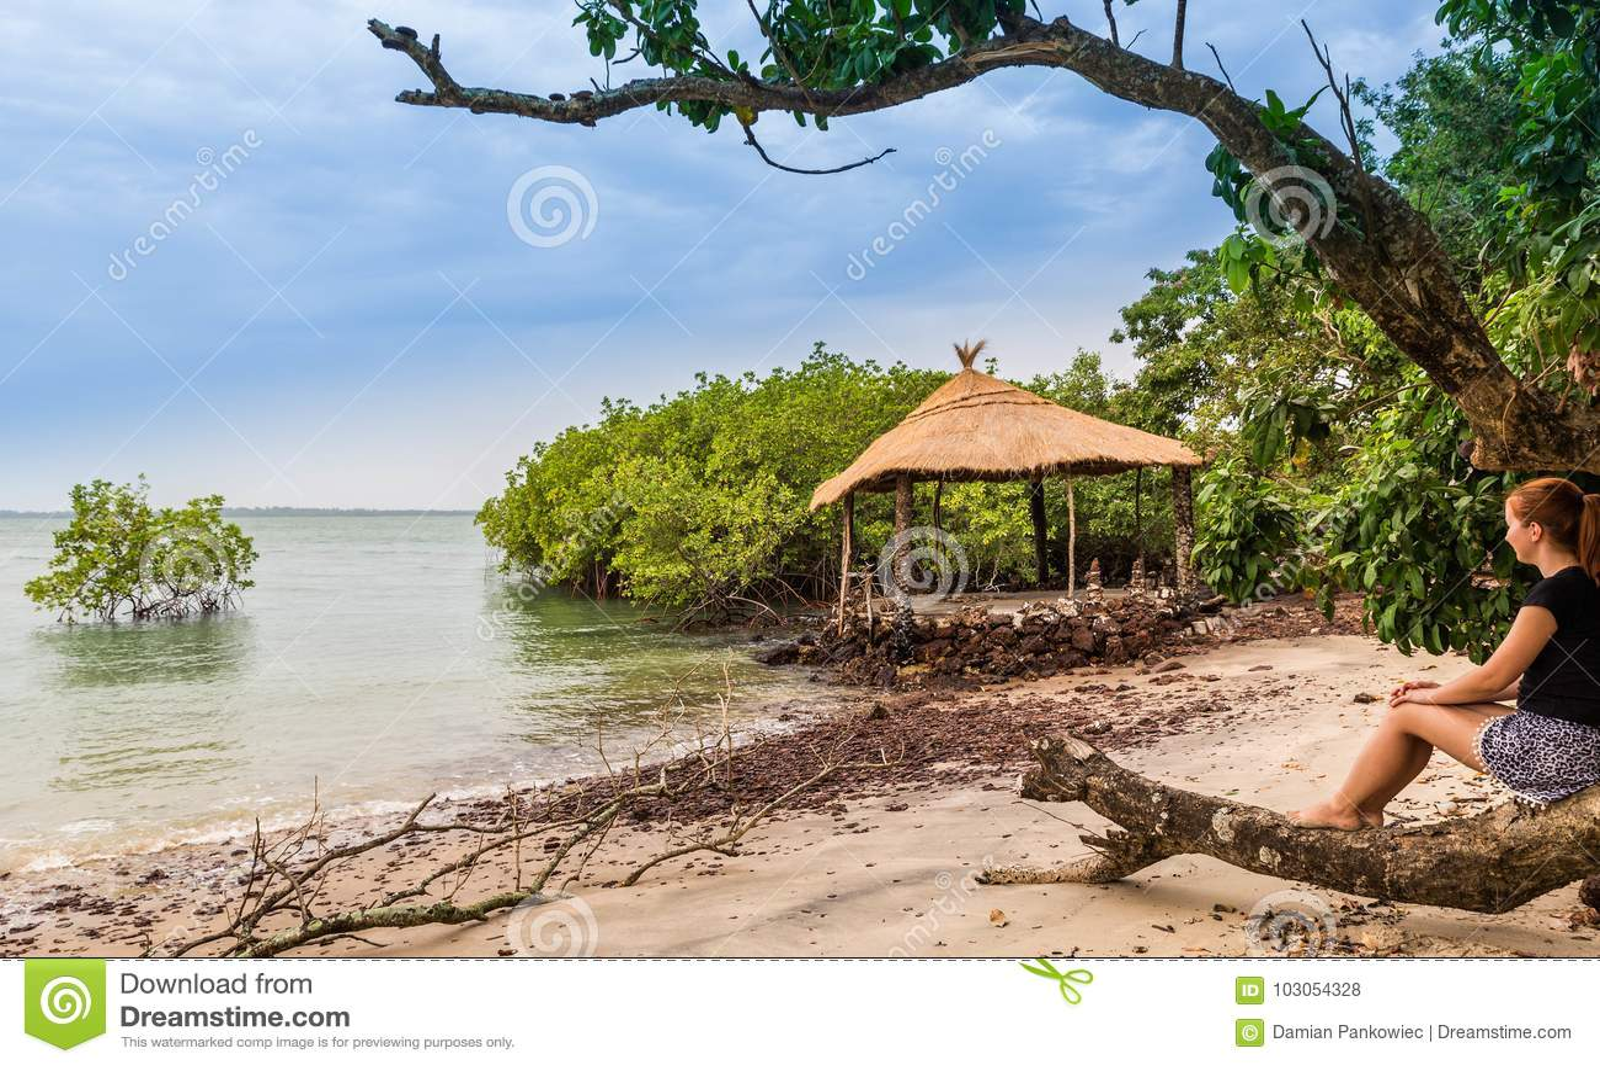 West africa Guinea-Bissau Bijagos islands